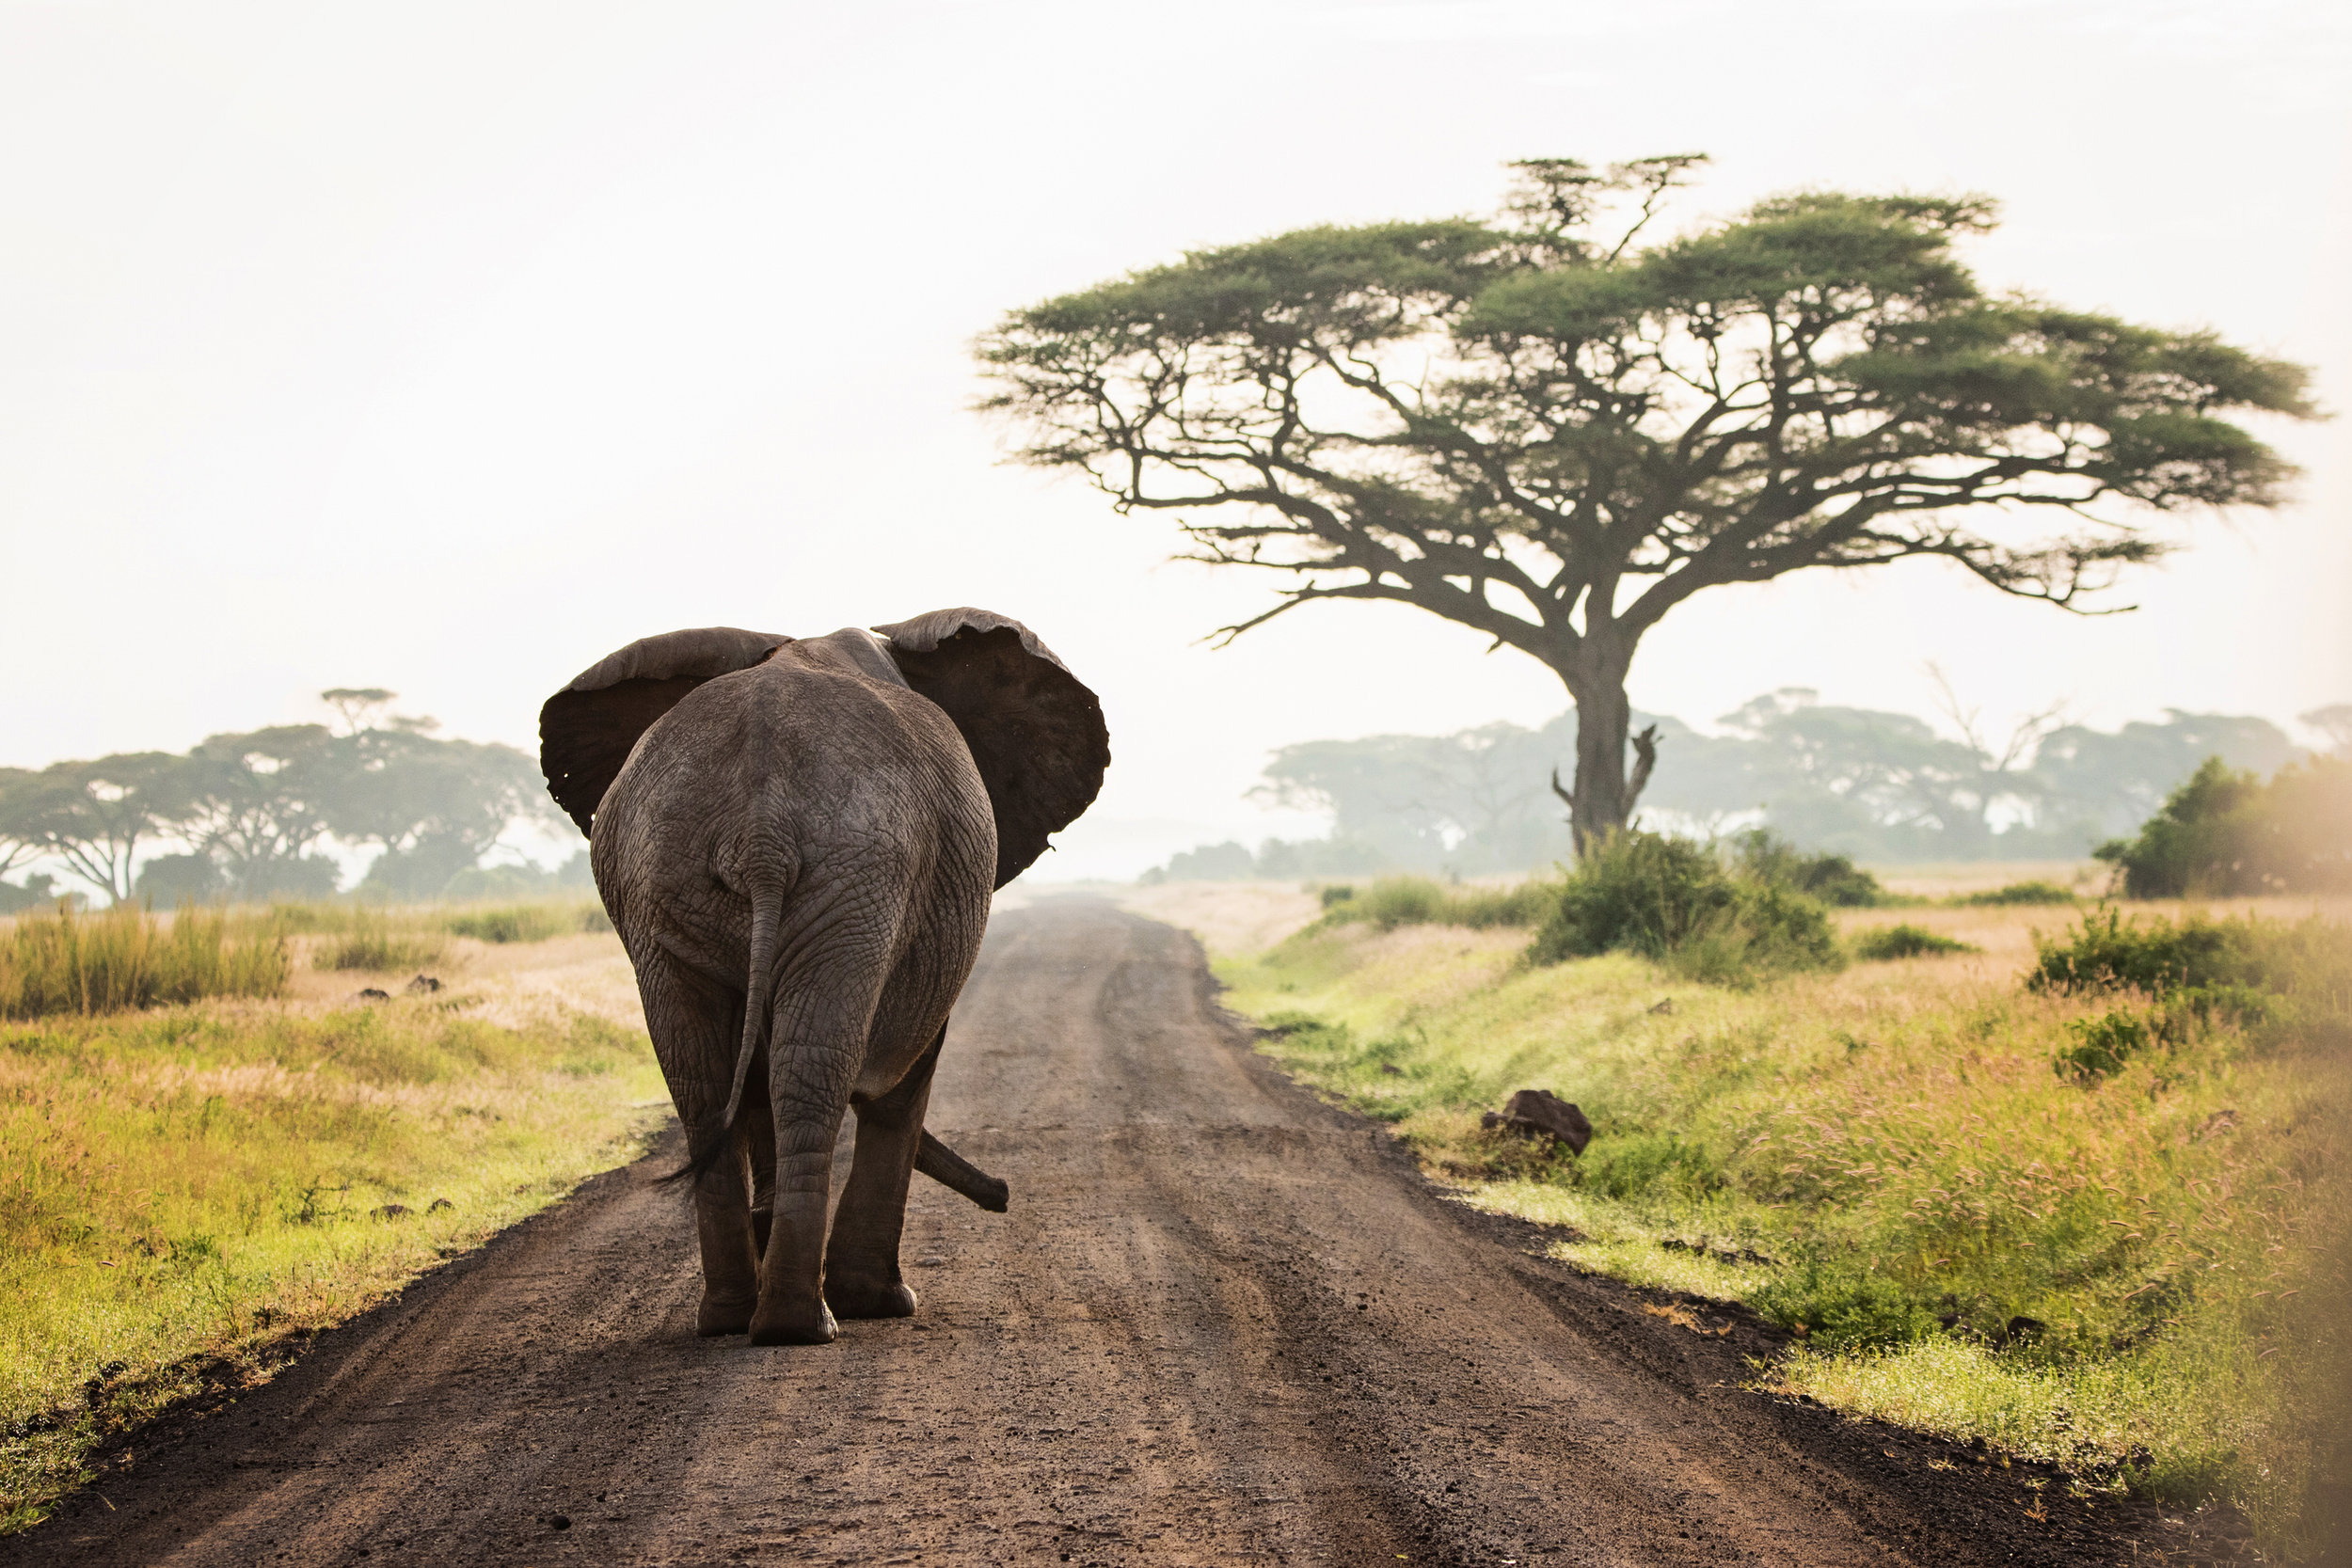 Kenya - January 2020